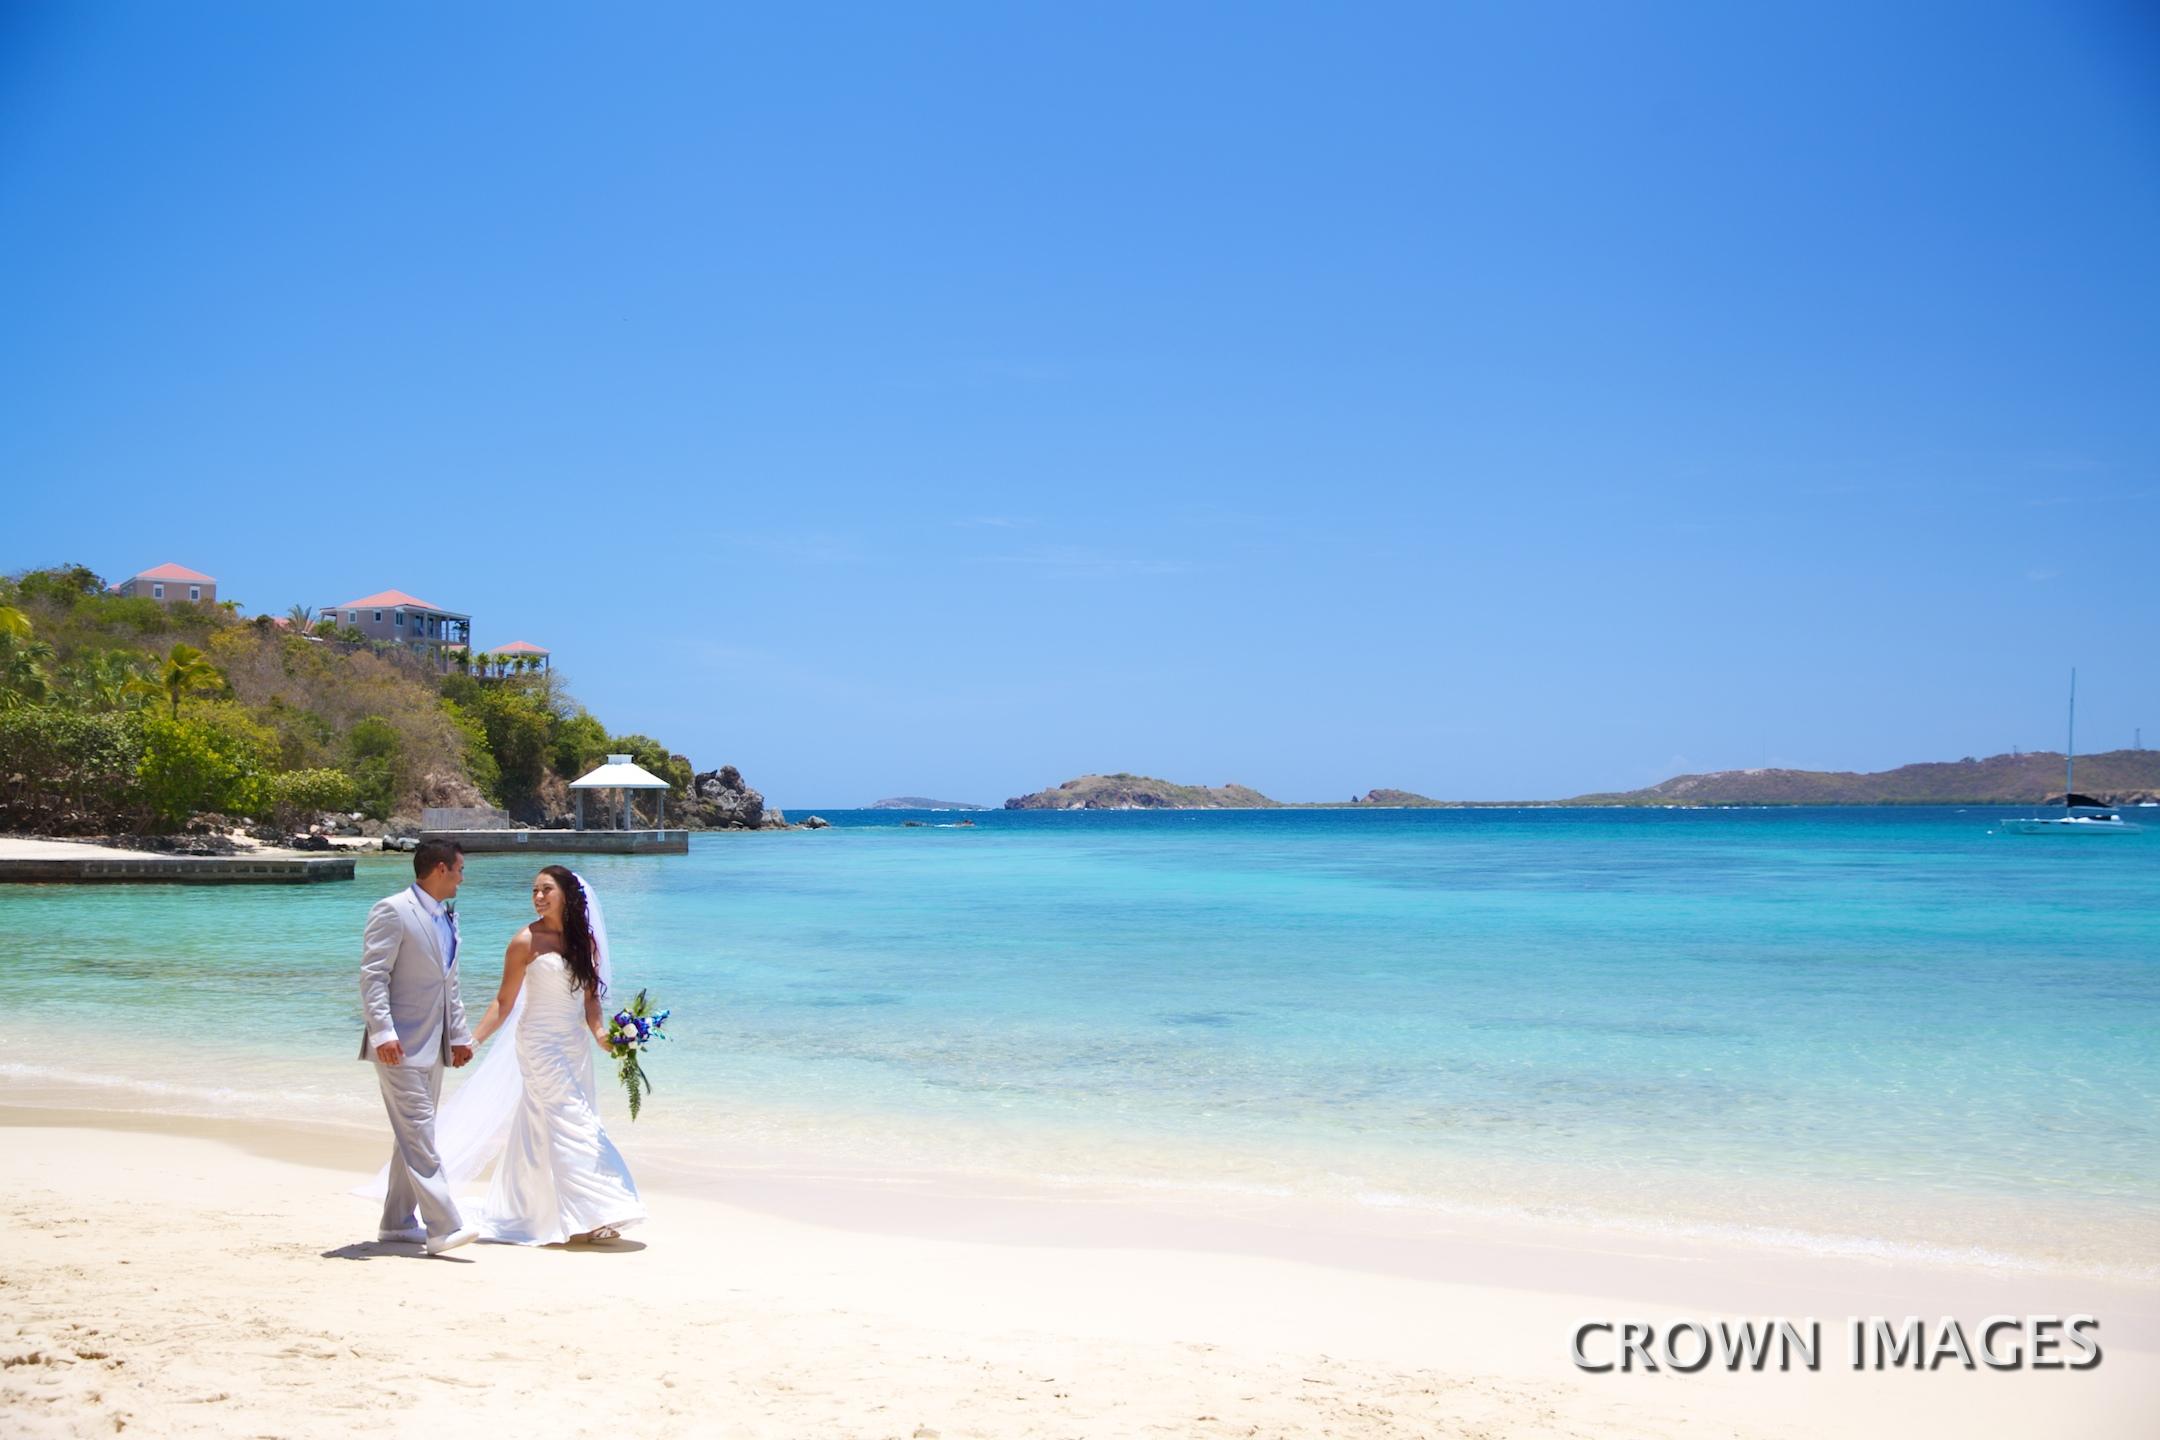 st thomas wedding locations on the beach